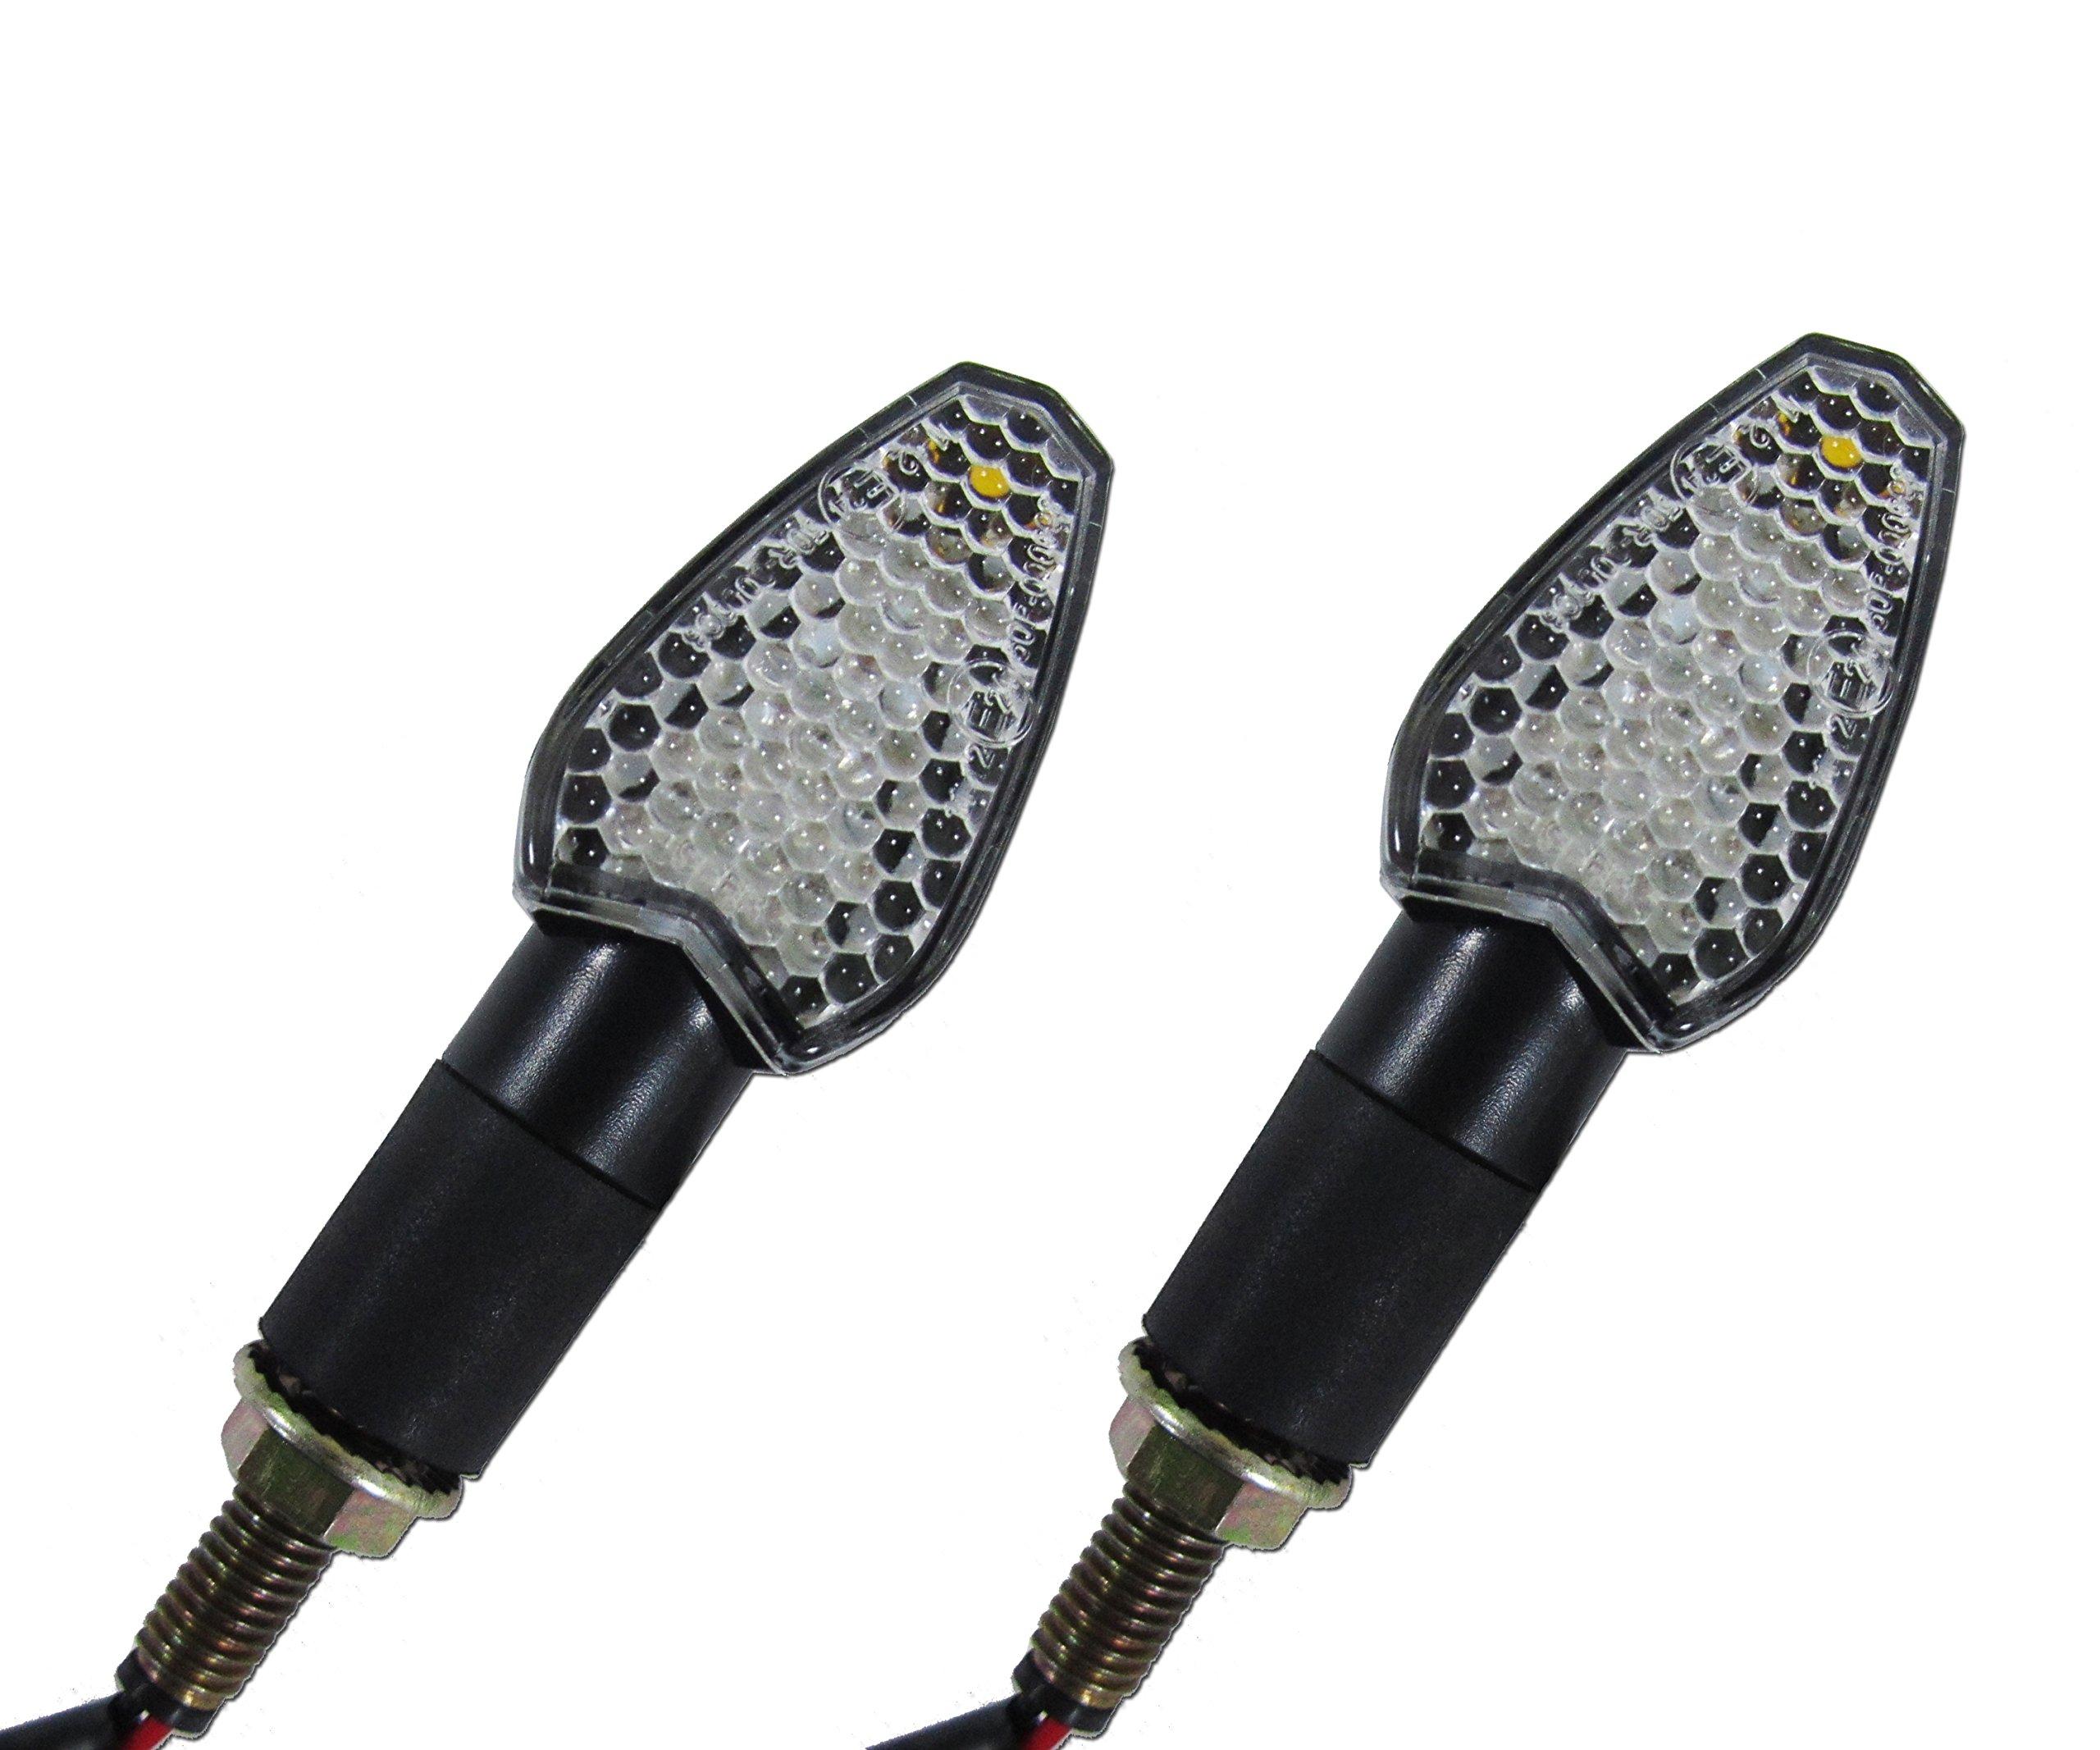 LED Mini Black Arrow Motorcycle Turn Signal Indicator Directional Lights Front/Rear Pair (2 Blinkers) for Aprilia, Buell, BMW, Harley, Honda, Kawasaki, KTM, Moto Guzzi, Suzuki, Triumph, Yamaha